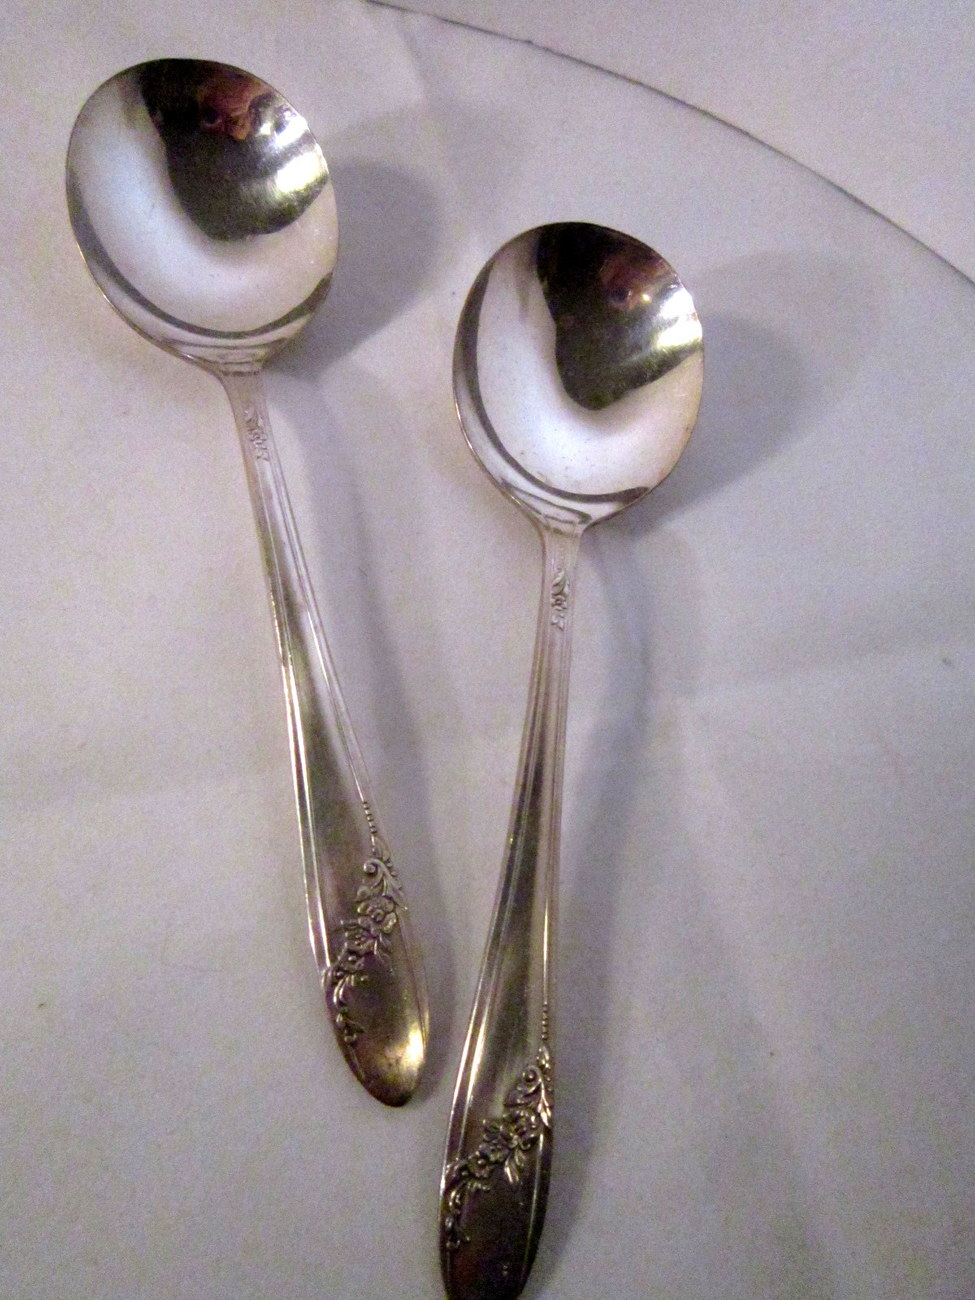 Onieda queen bess ii silverplate soup spoon 05